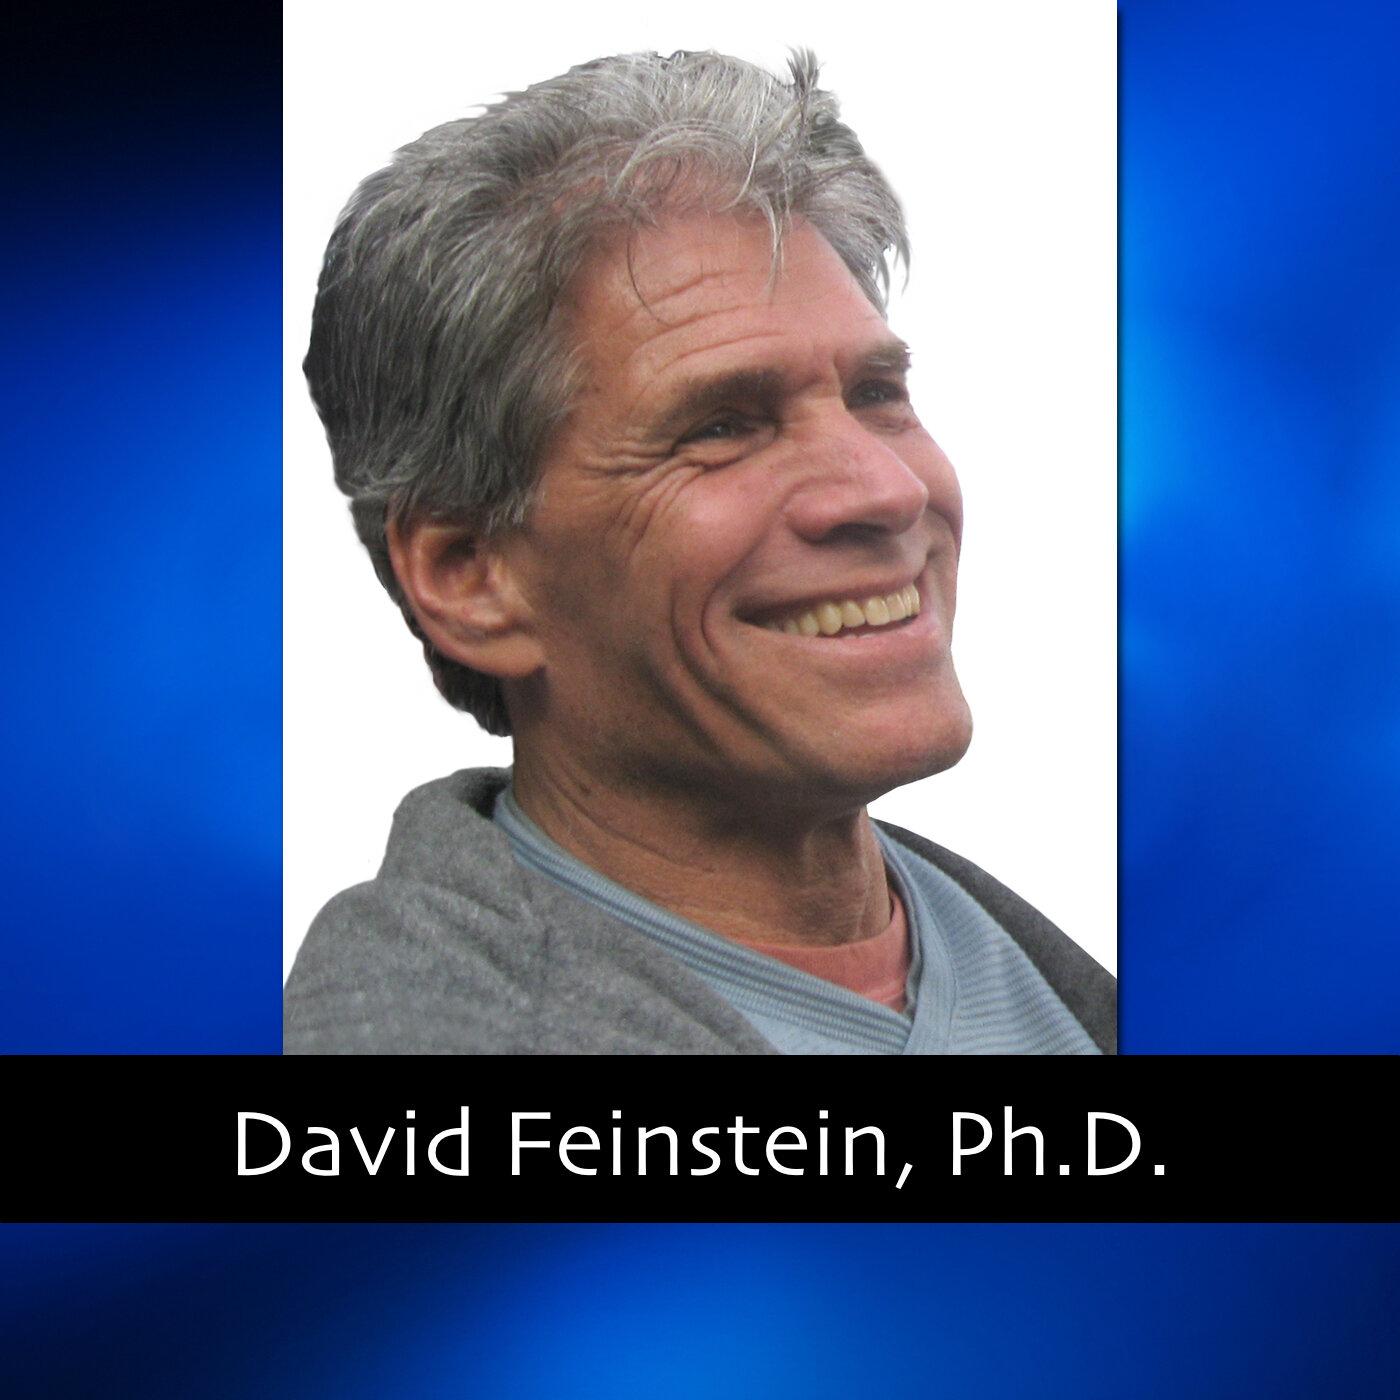 David Feinstein thumb.jpg